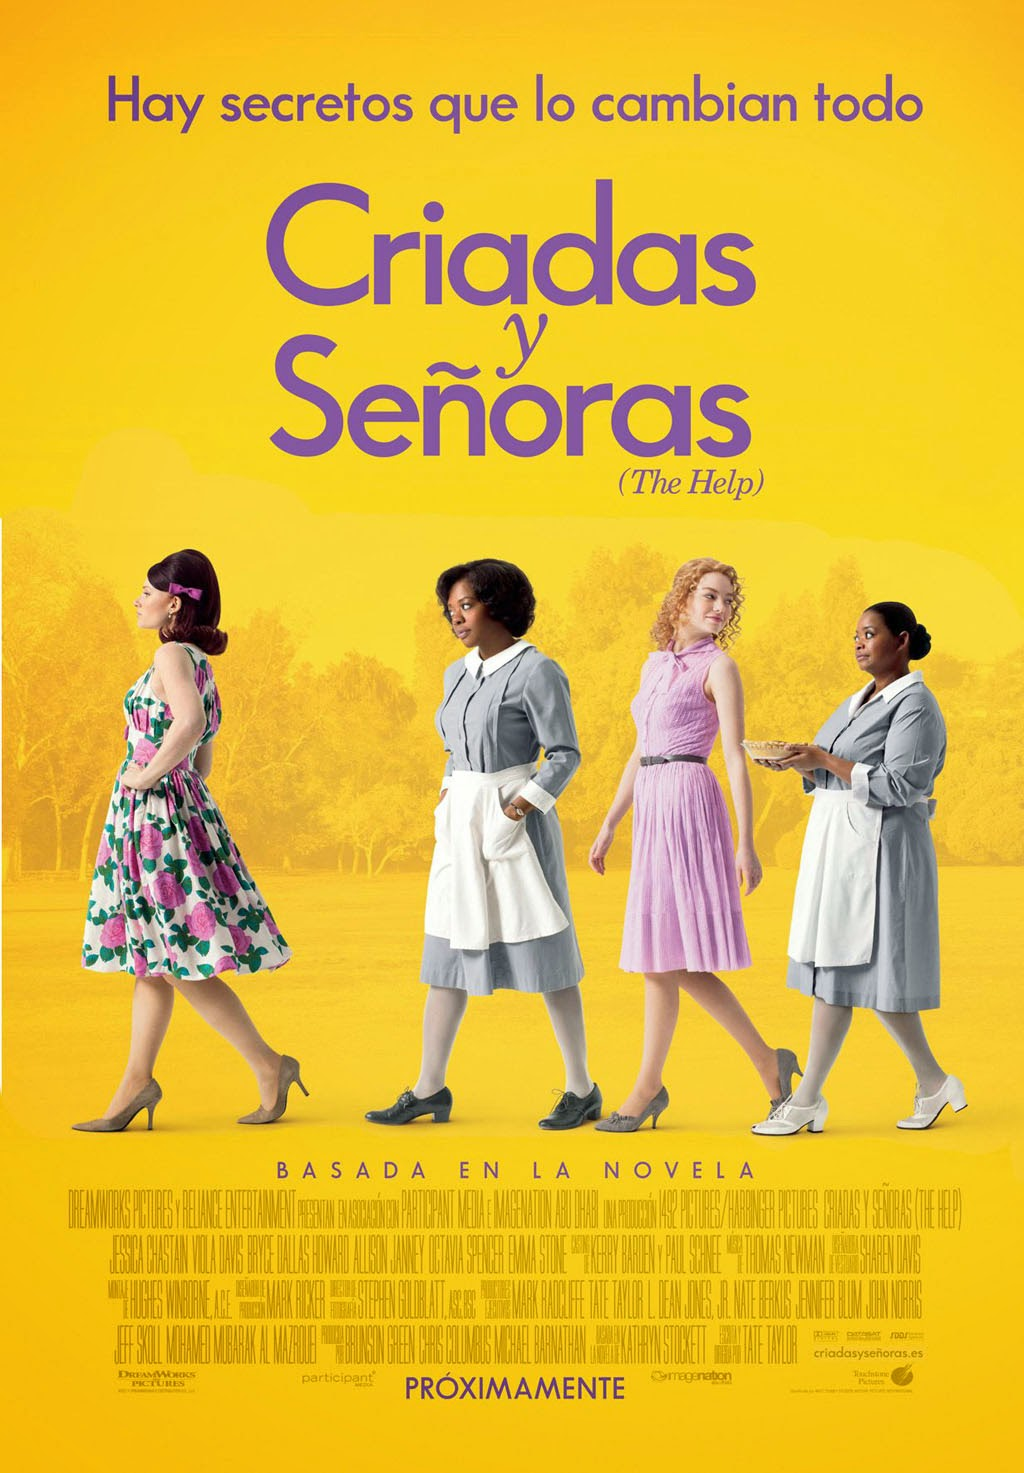 http://www.armonia-de-letras.blogspot.com.es/2014/07/criadas-y-senoras-kathryn-stockett.html